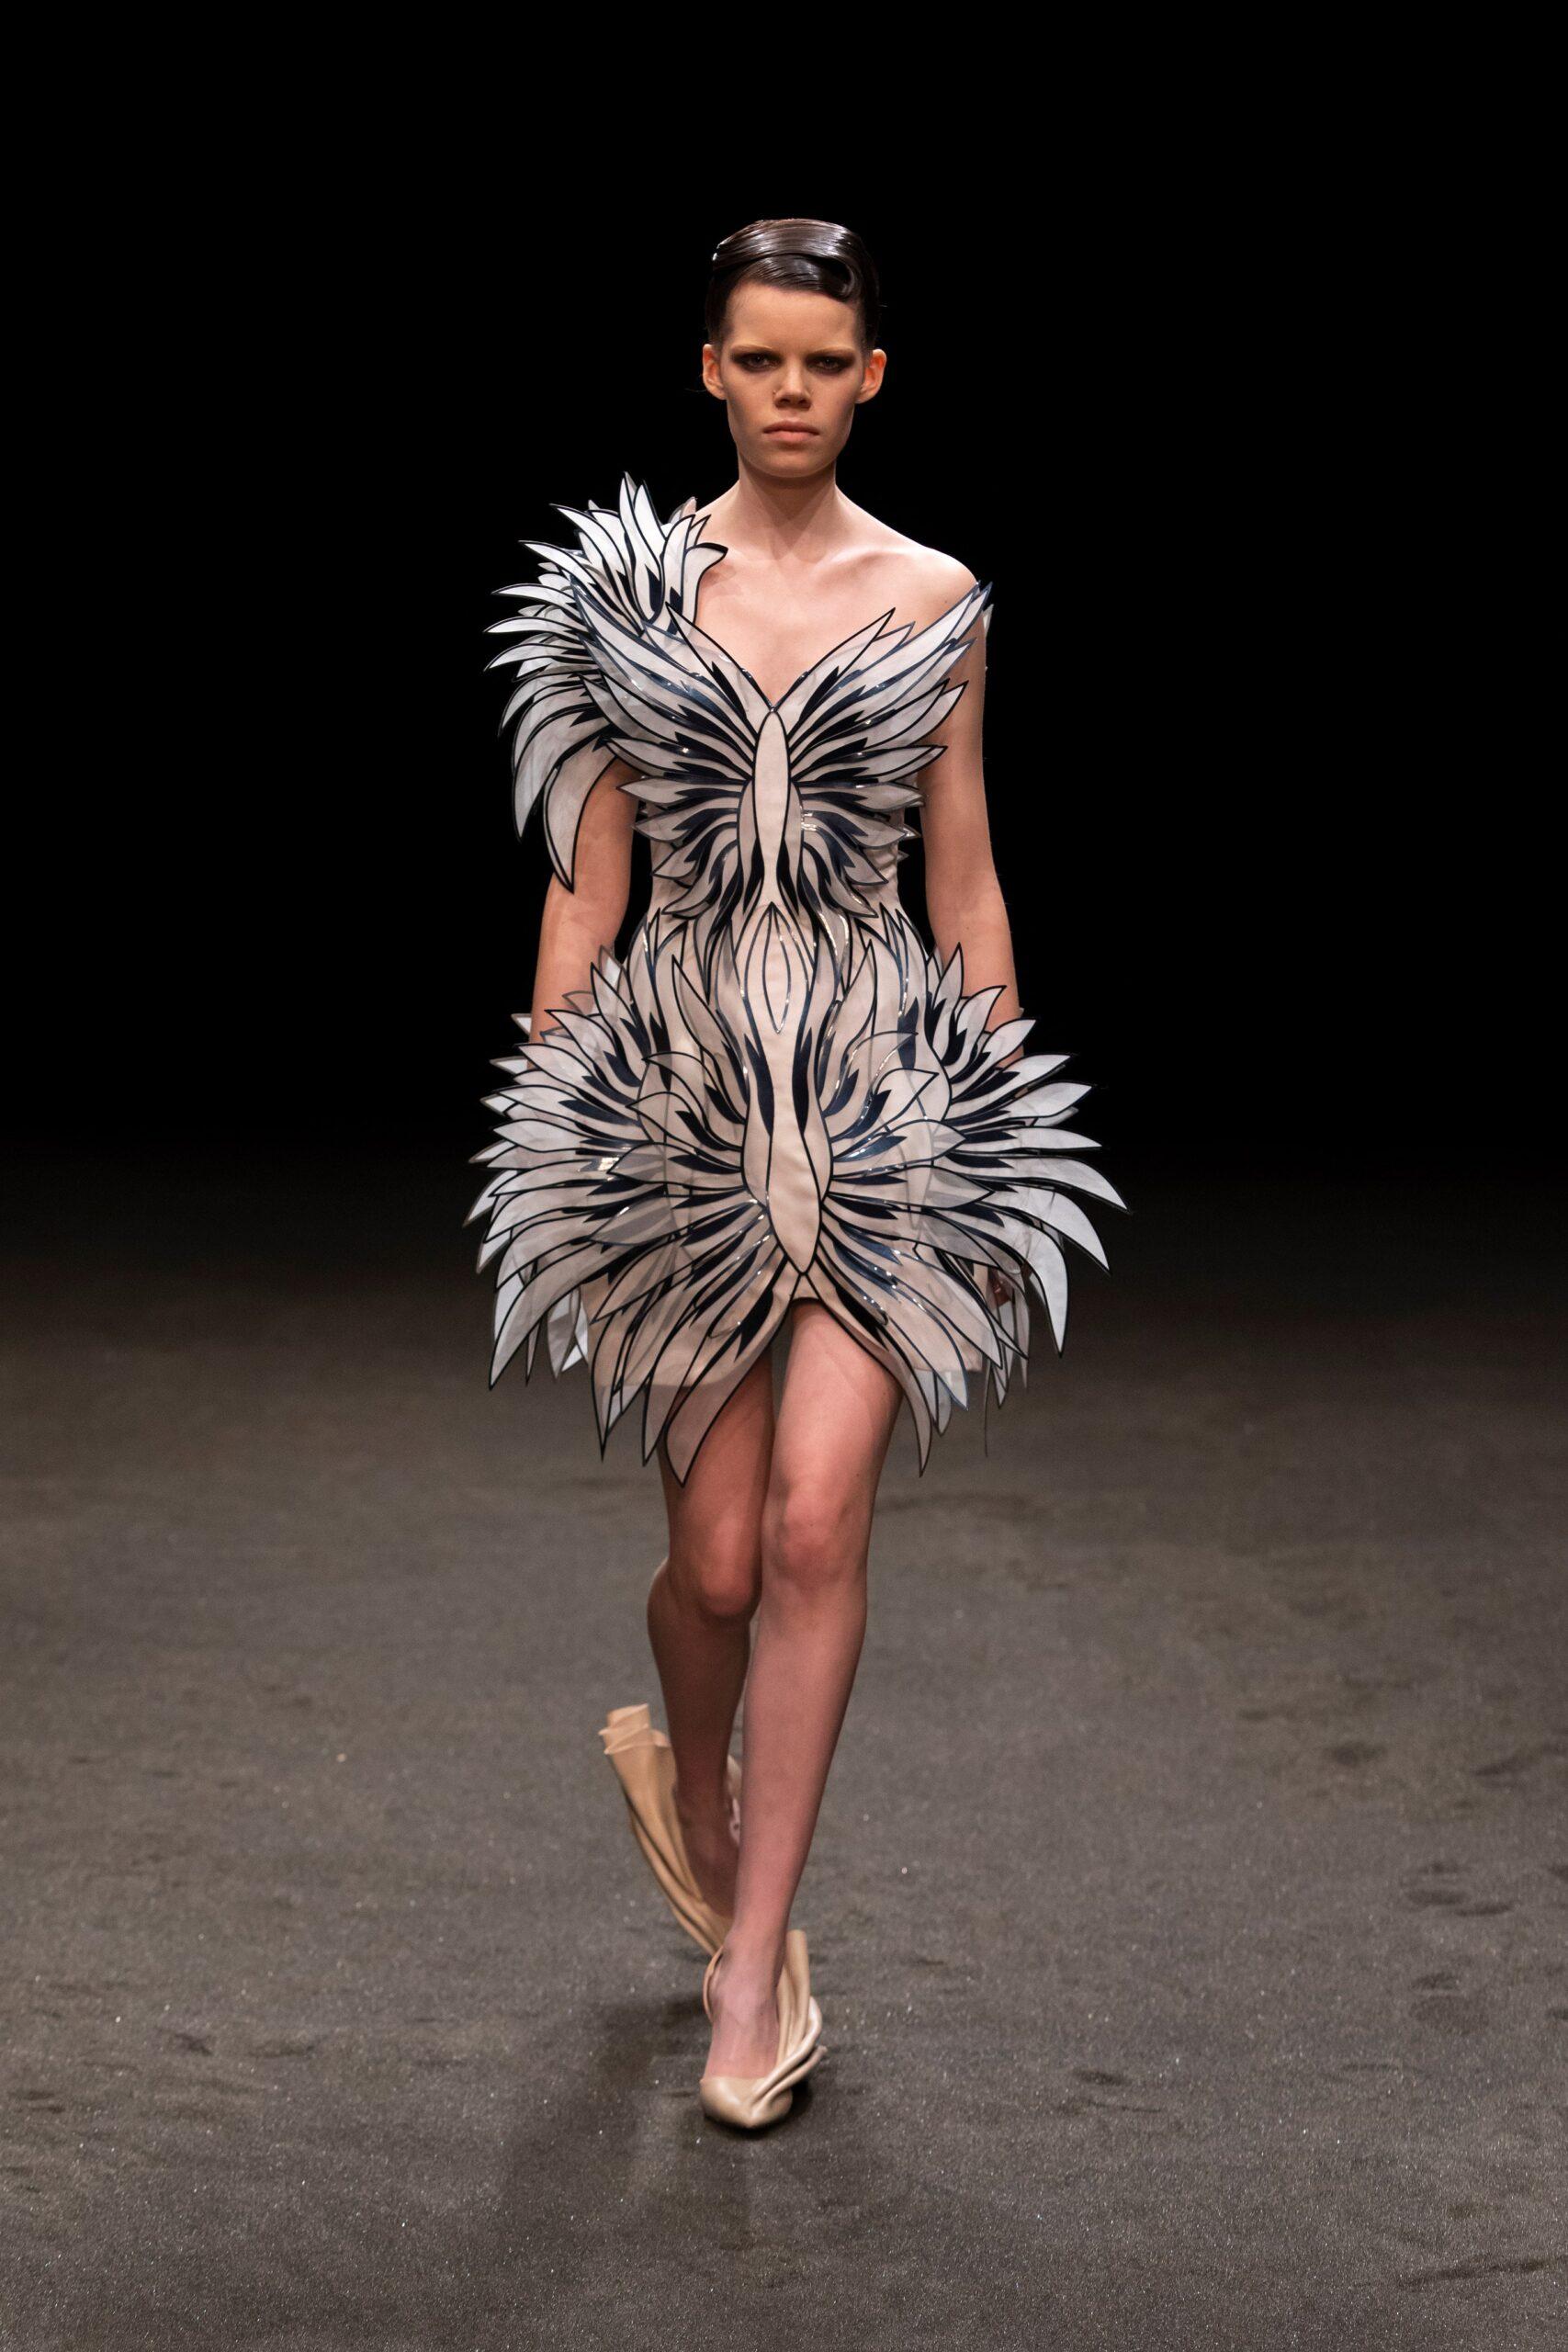 00008 Iris van Herpen Couture Spring 21 credit Gio Staiano